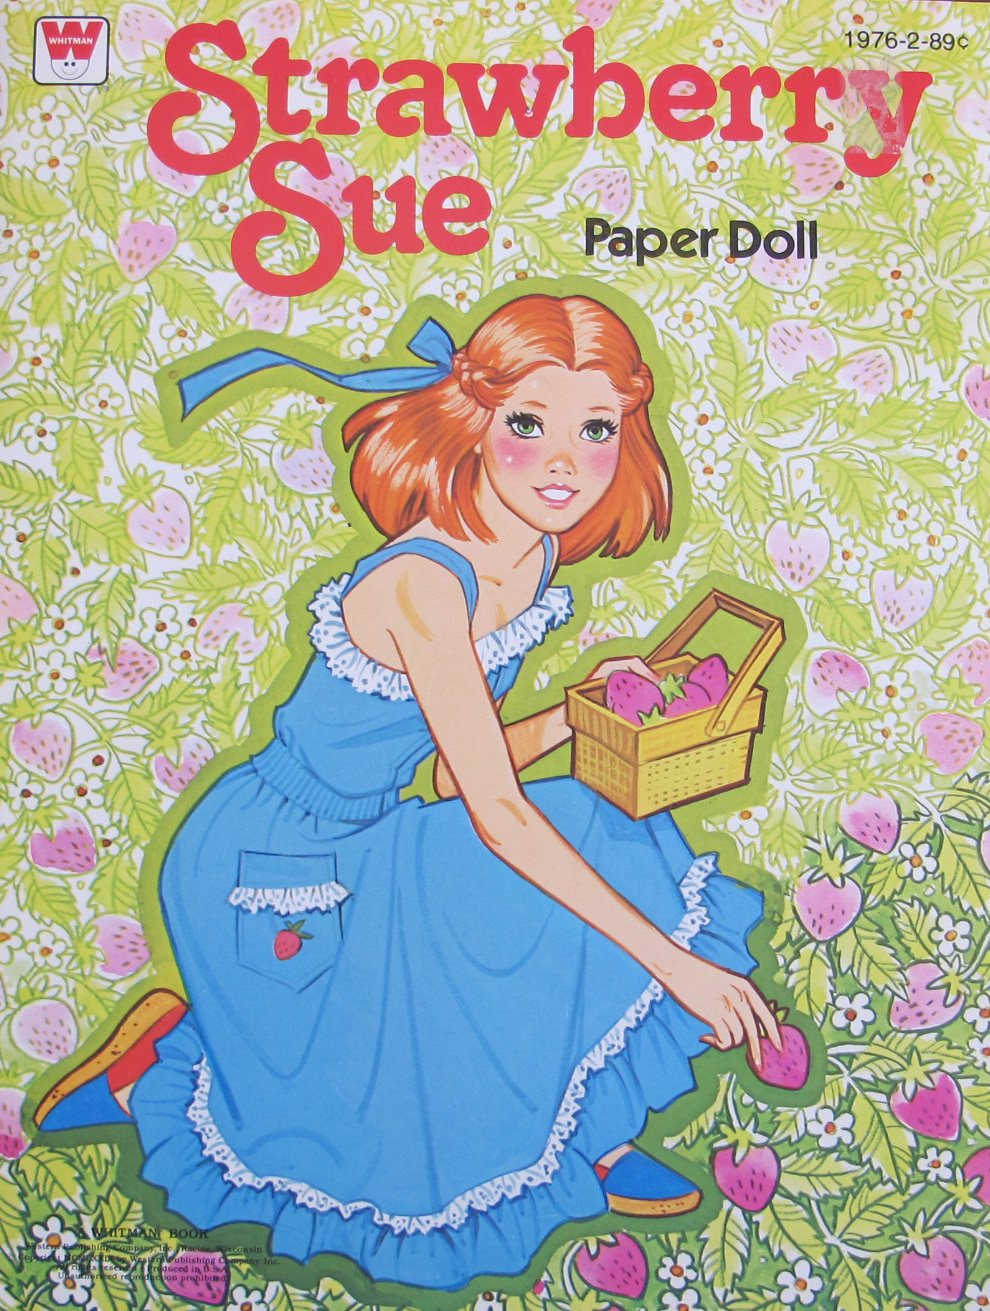 Whitman STRAWBERRY SUE PAPER DOLL Book UNCUT w Press Out Doll &Fashions (1979)